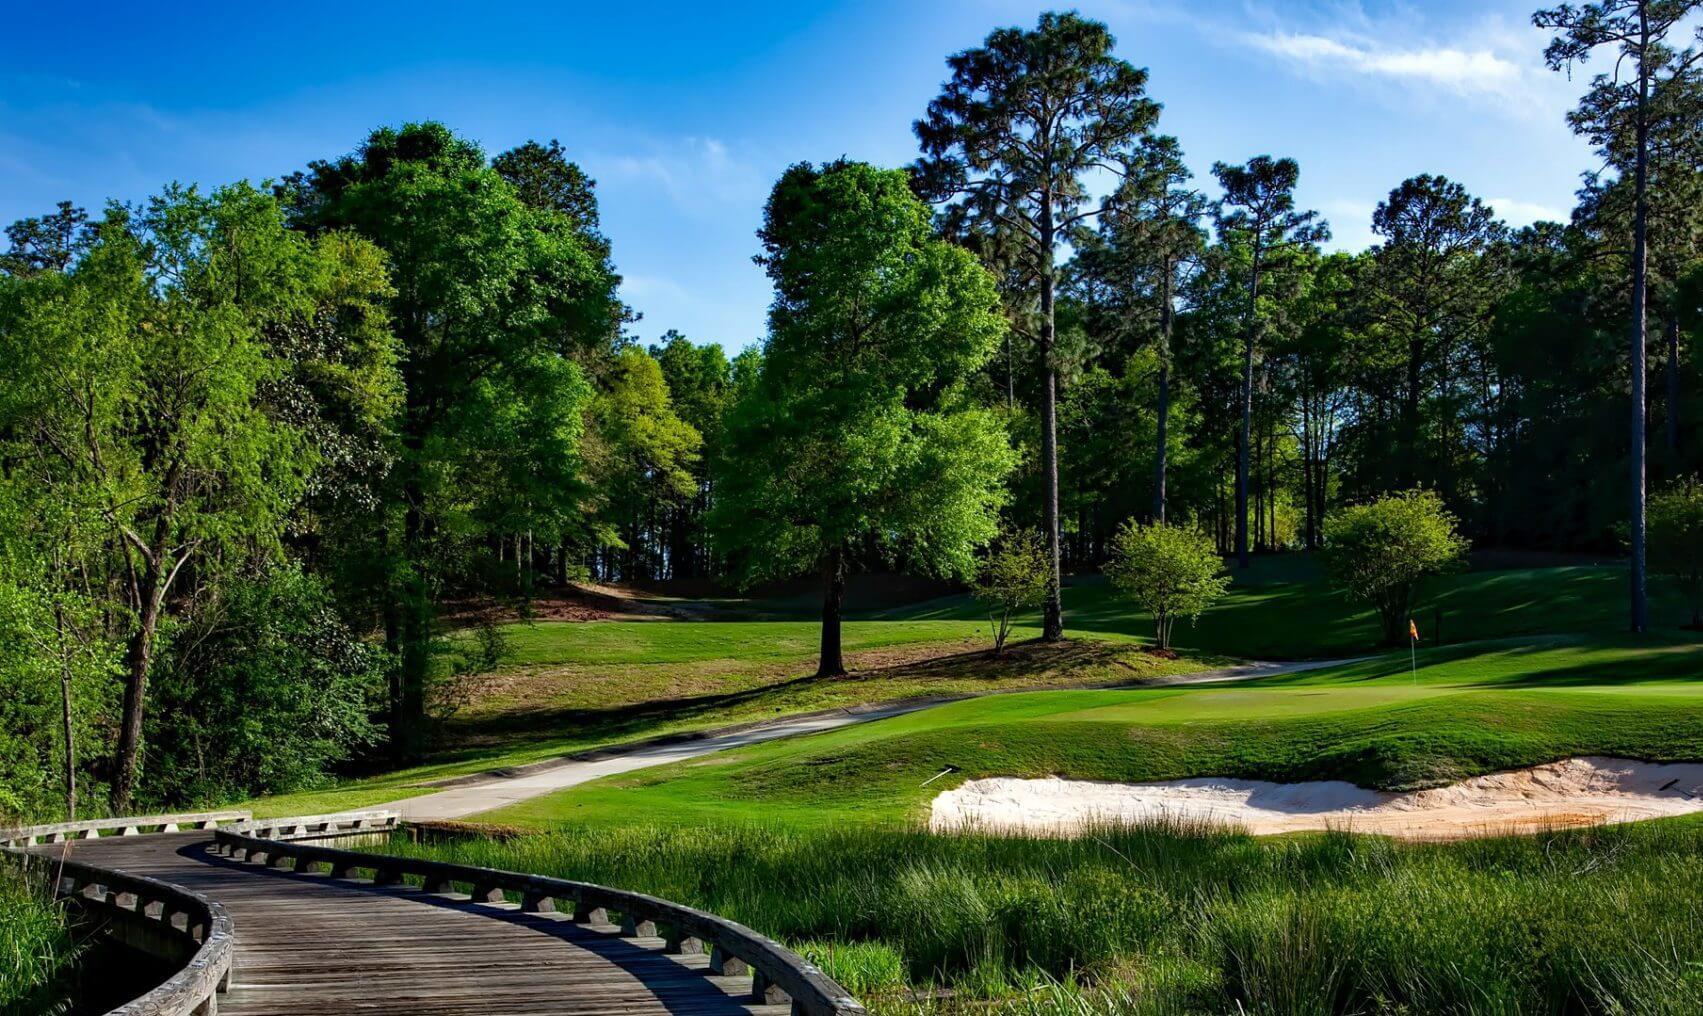 John Dunigan Golf course pic2